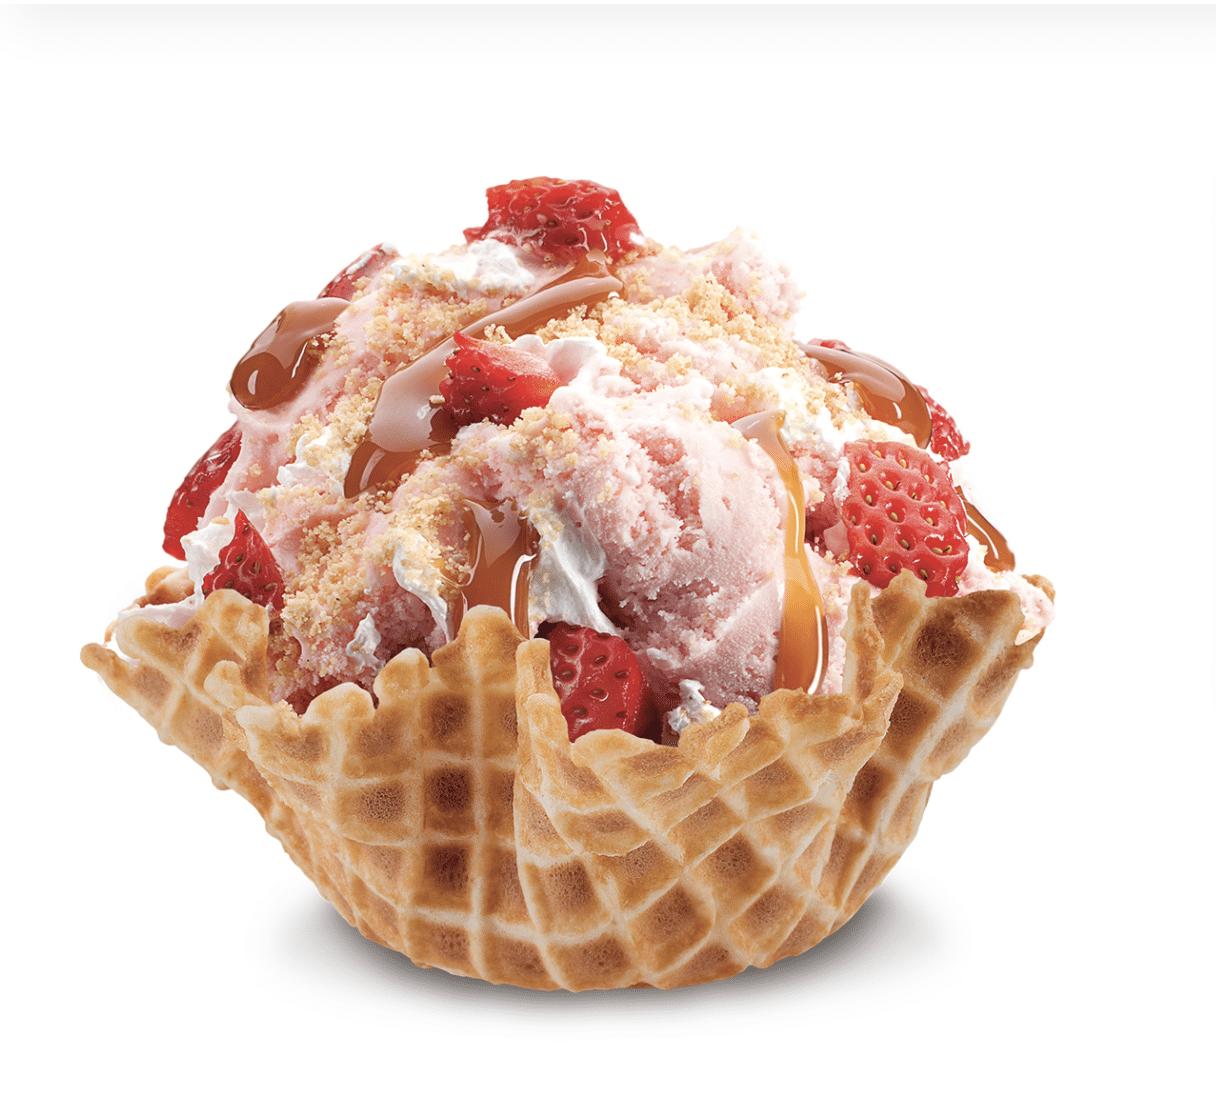 Our Strawberry Blonde Cold Stone Creamery Ice Cream Truck